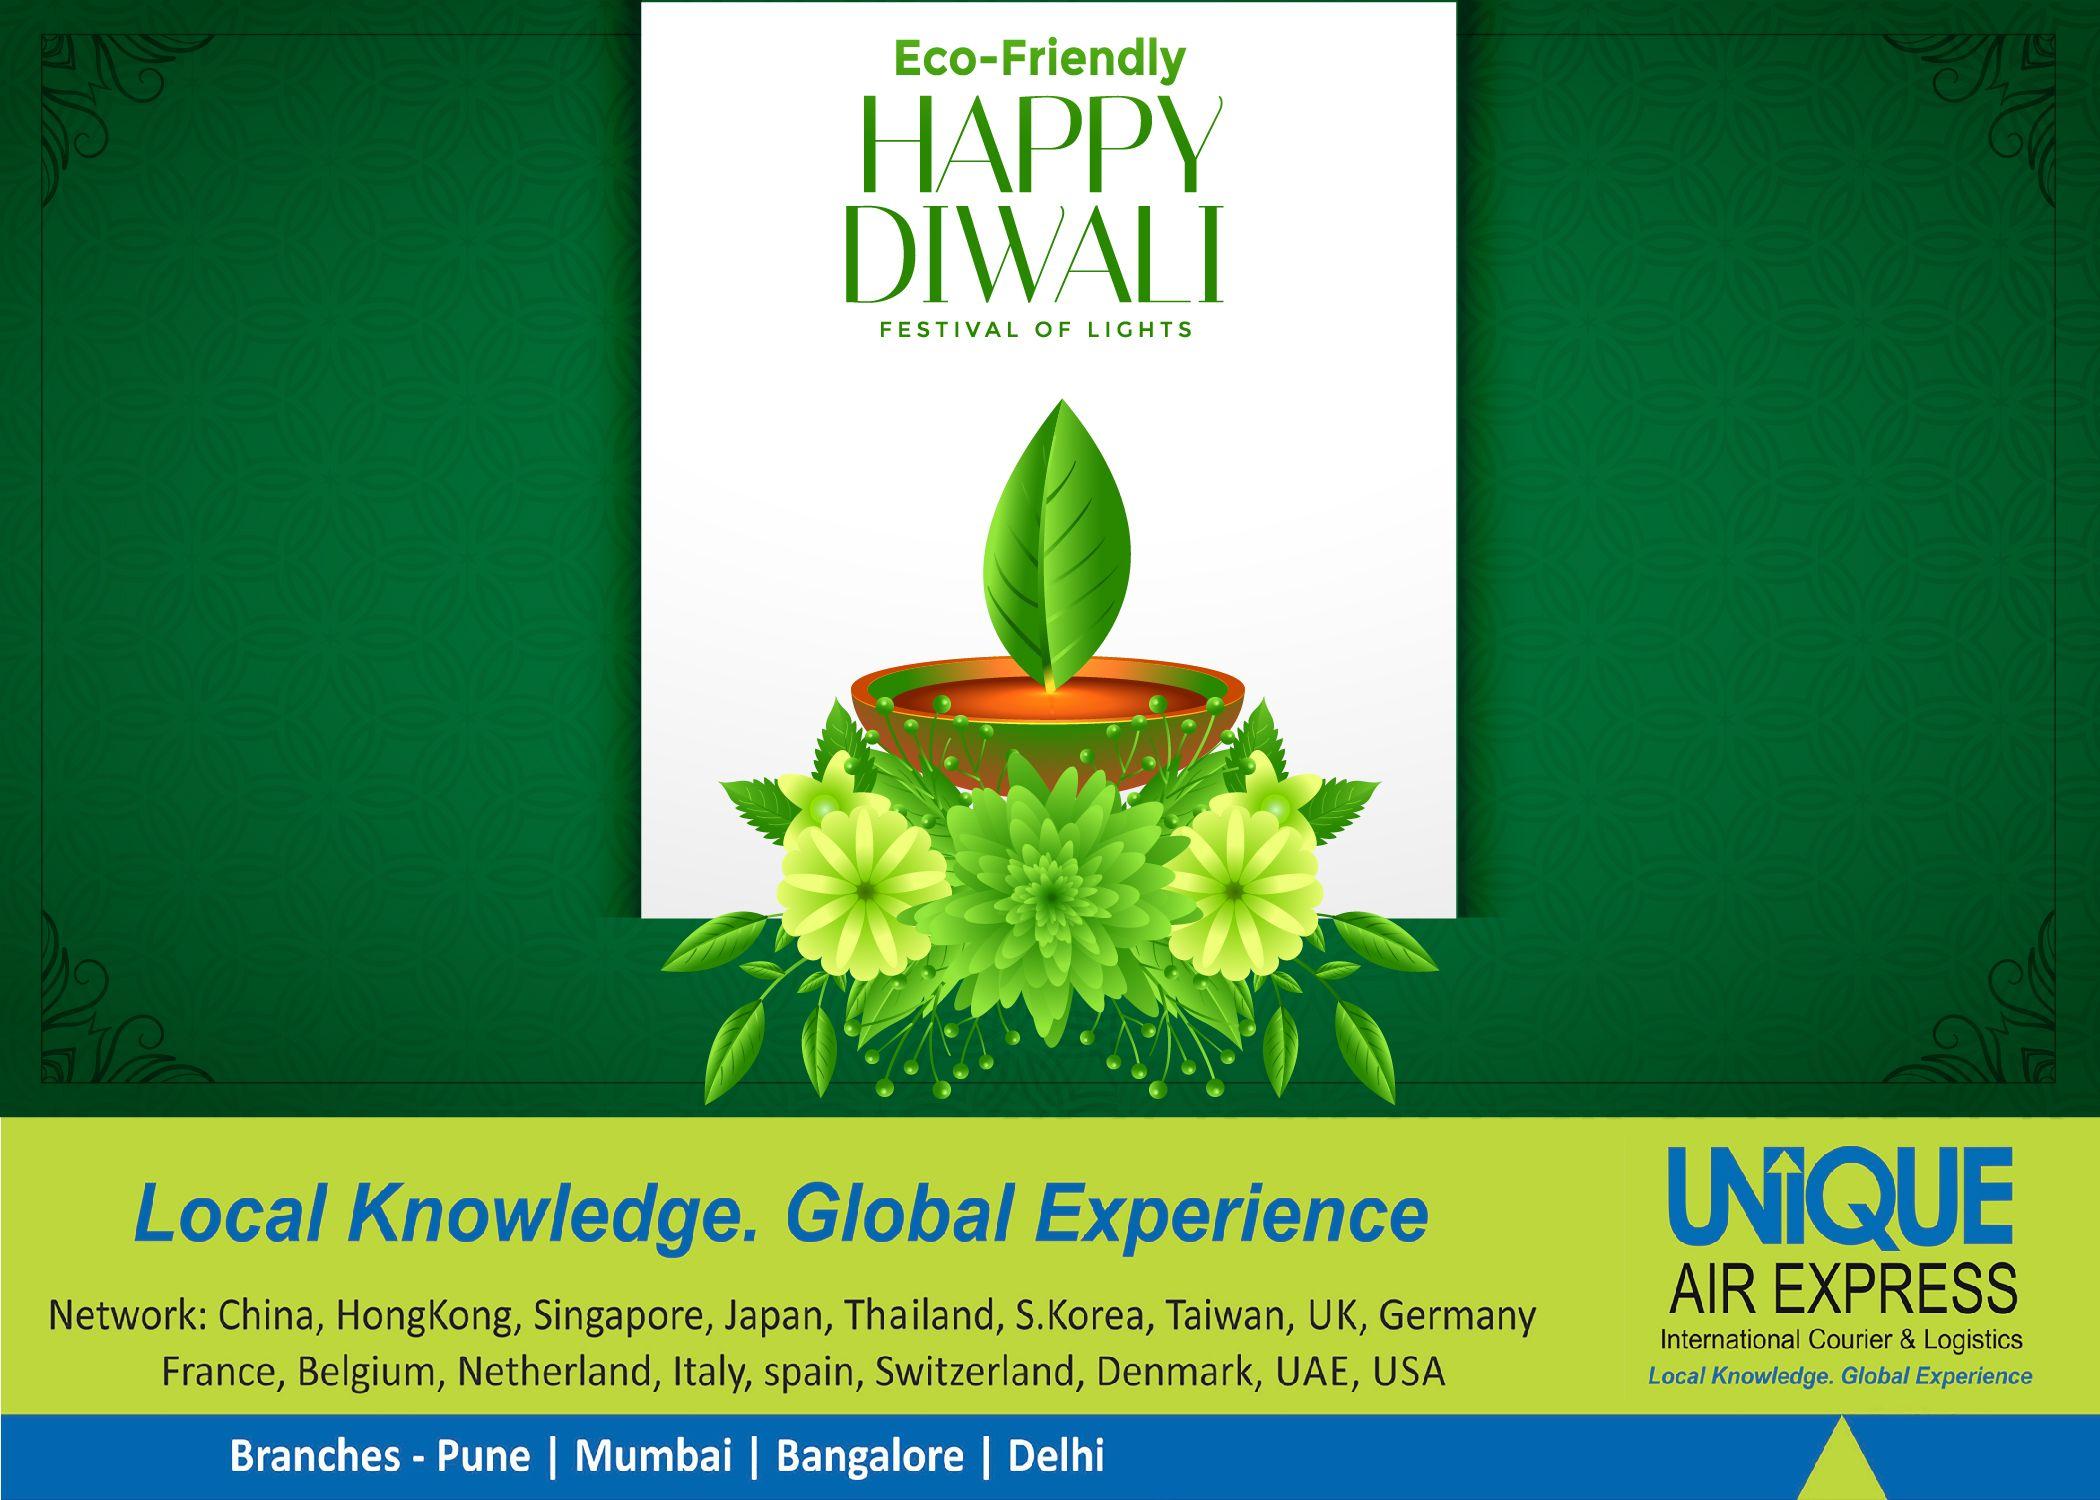 Celebrate An Environmentally Safe Diwali! Don't Act Mean